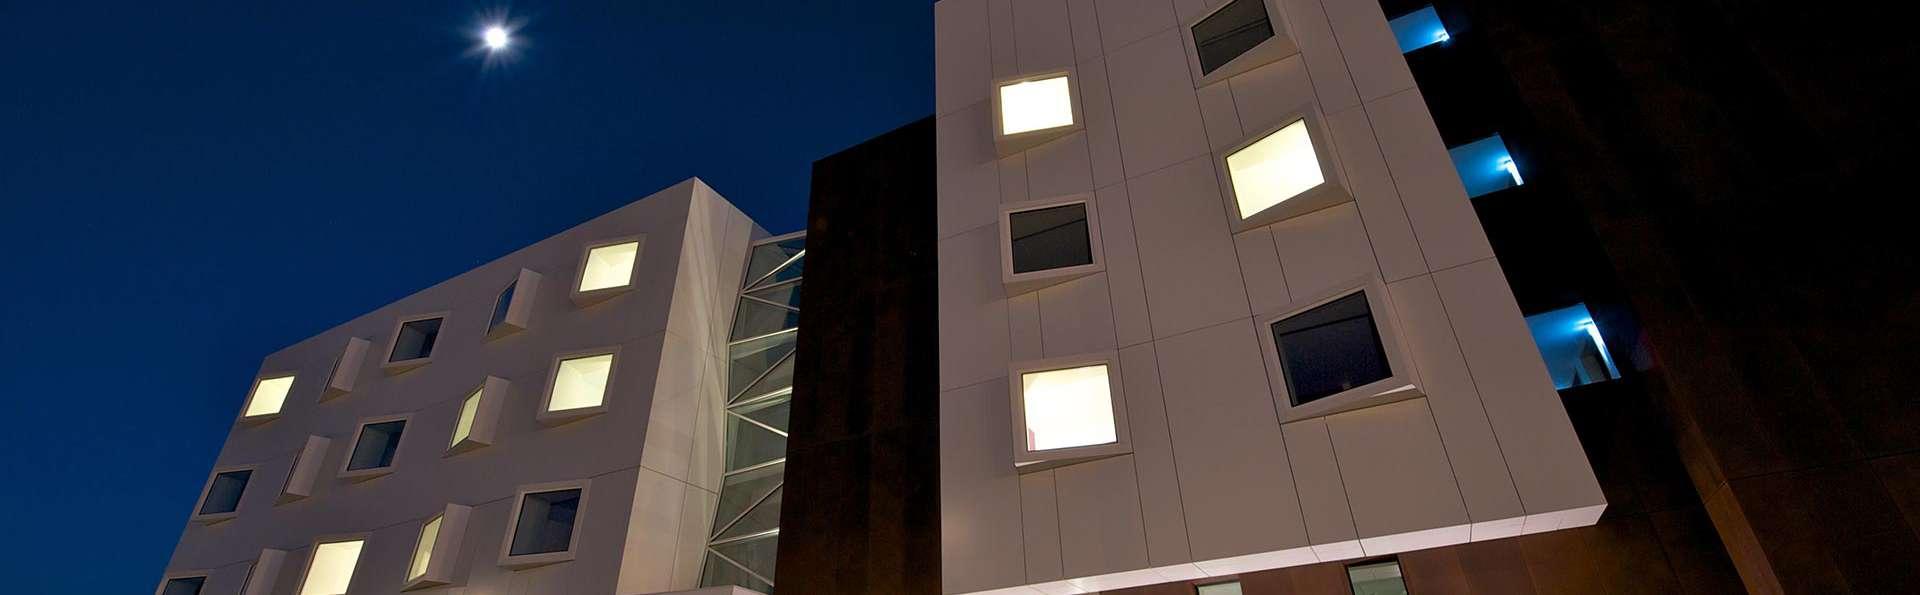 Le Nex Hotel - Edit_Front.jpg